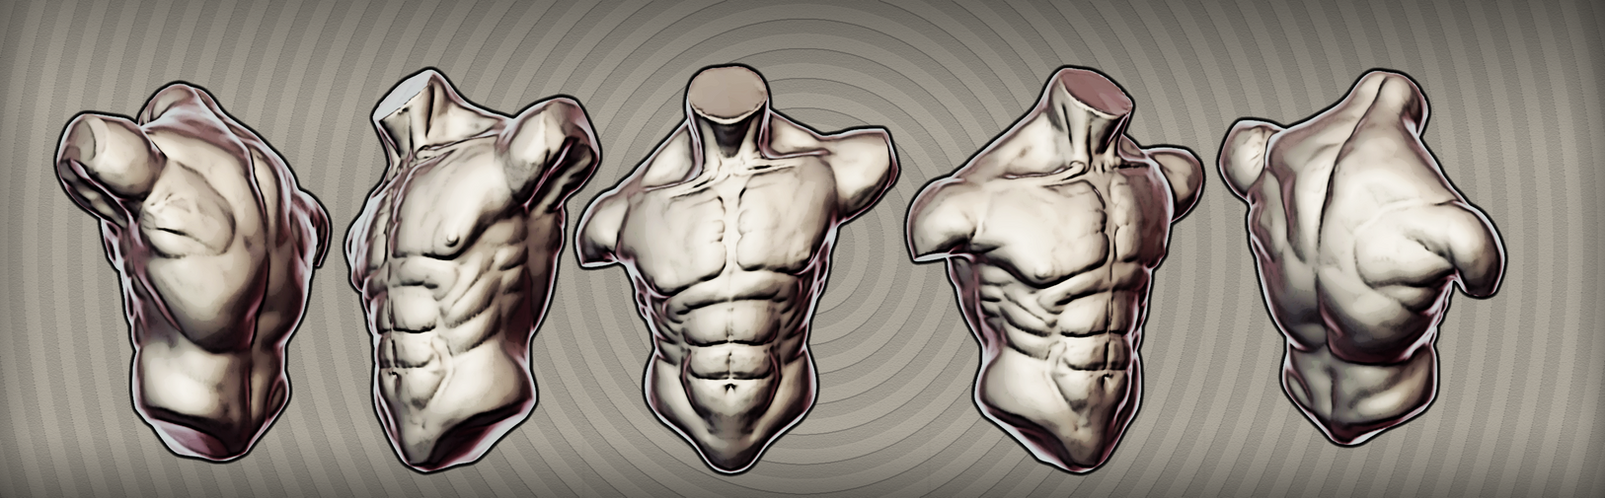 Male Anatomy Study by fumanshooh on DeviantArt